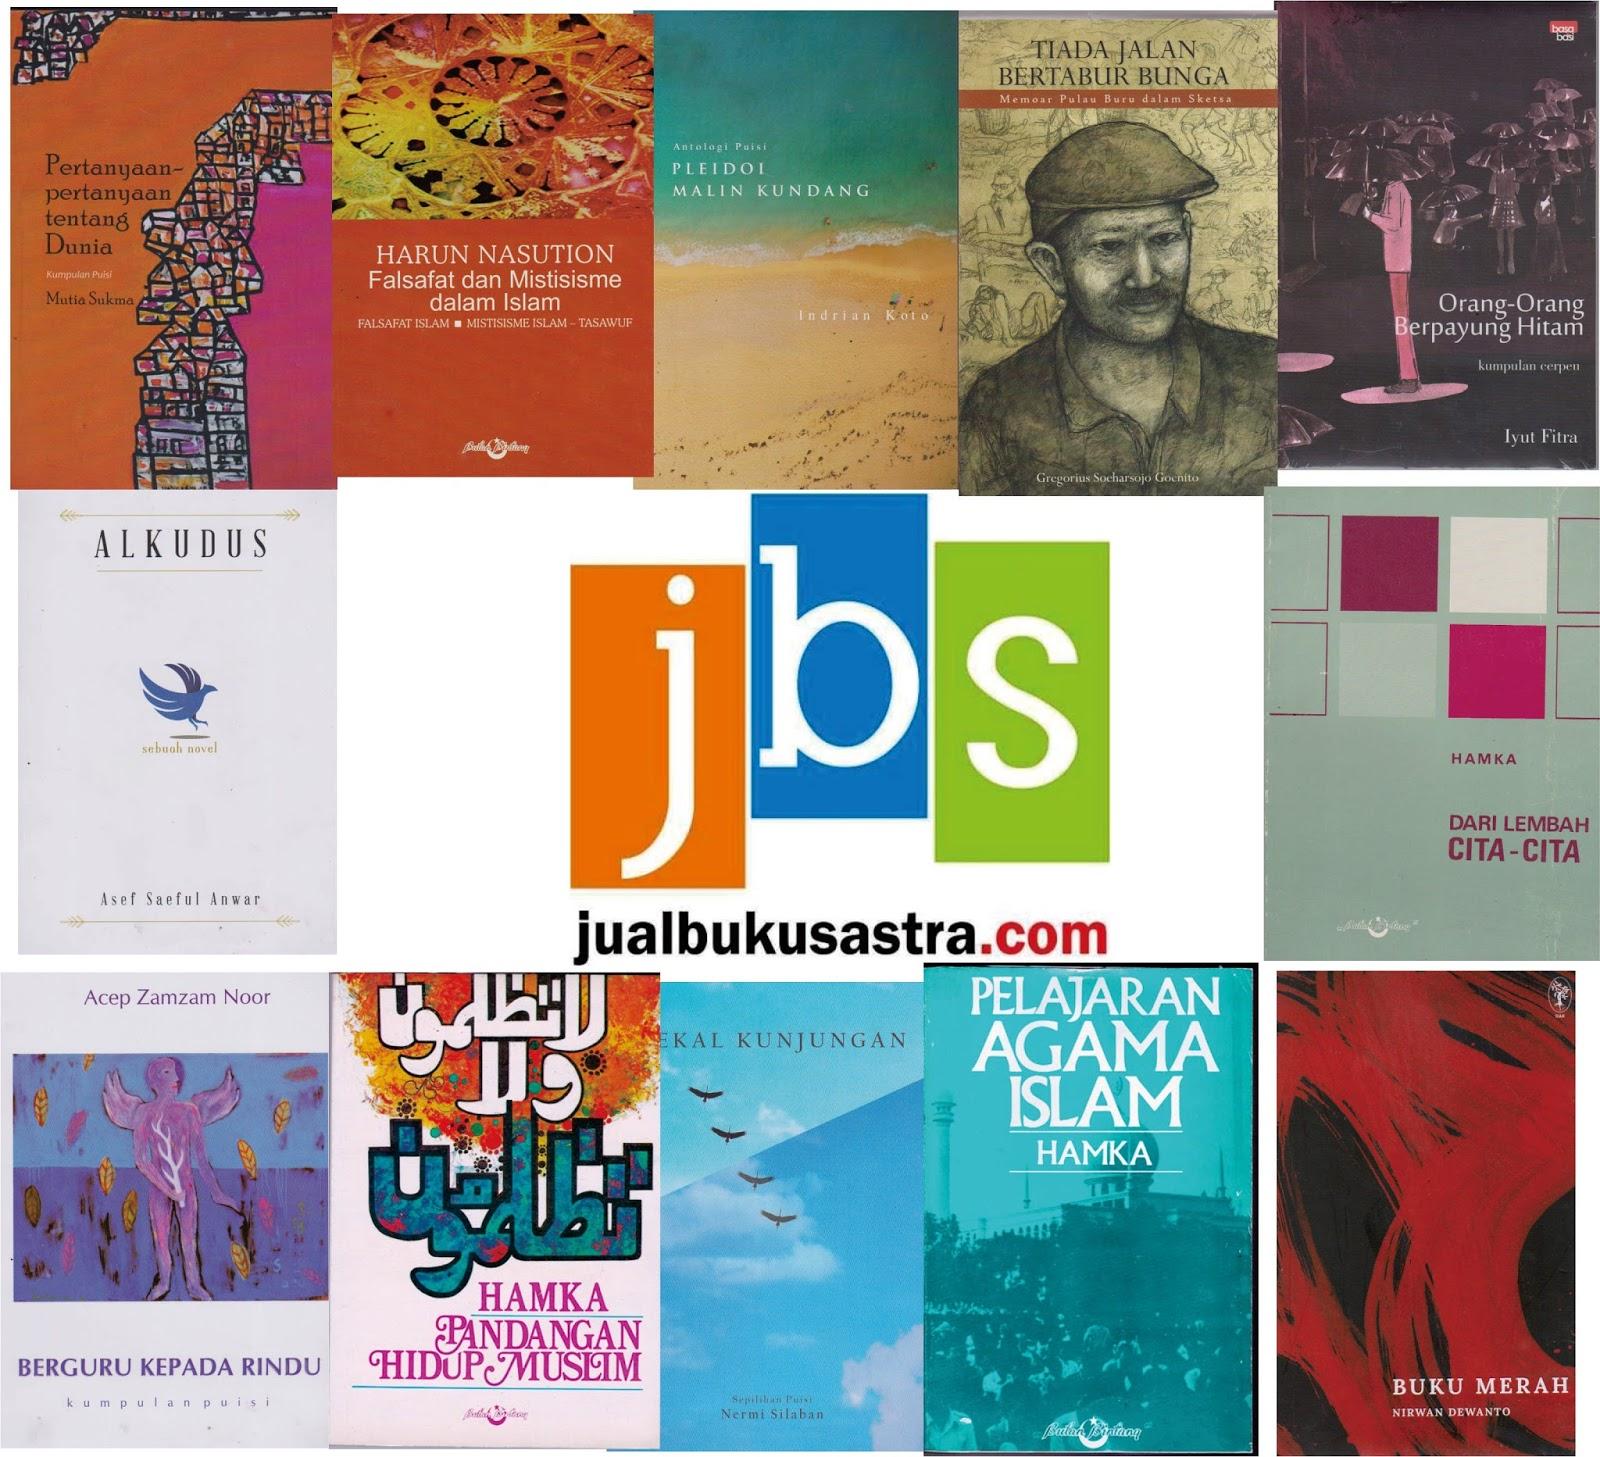 Jualan Buku Sastra: Katalog Sastra-Nonsastra Mei 2017